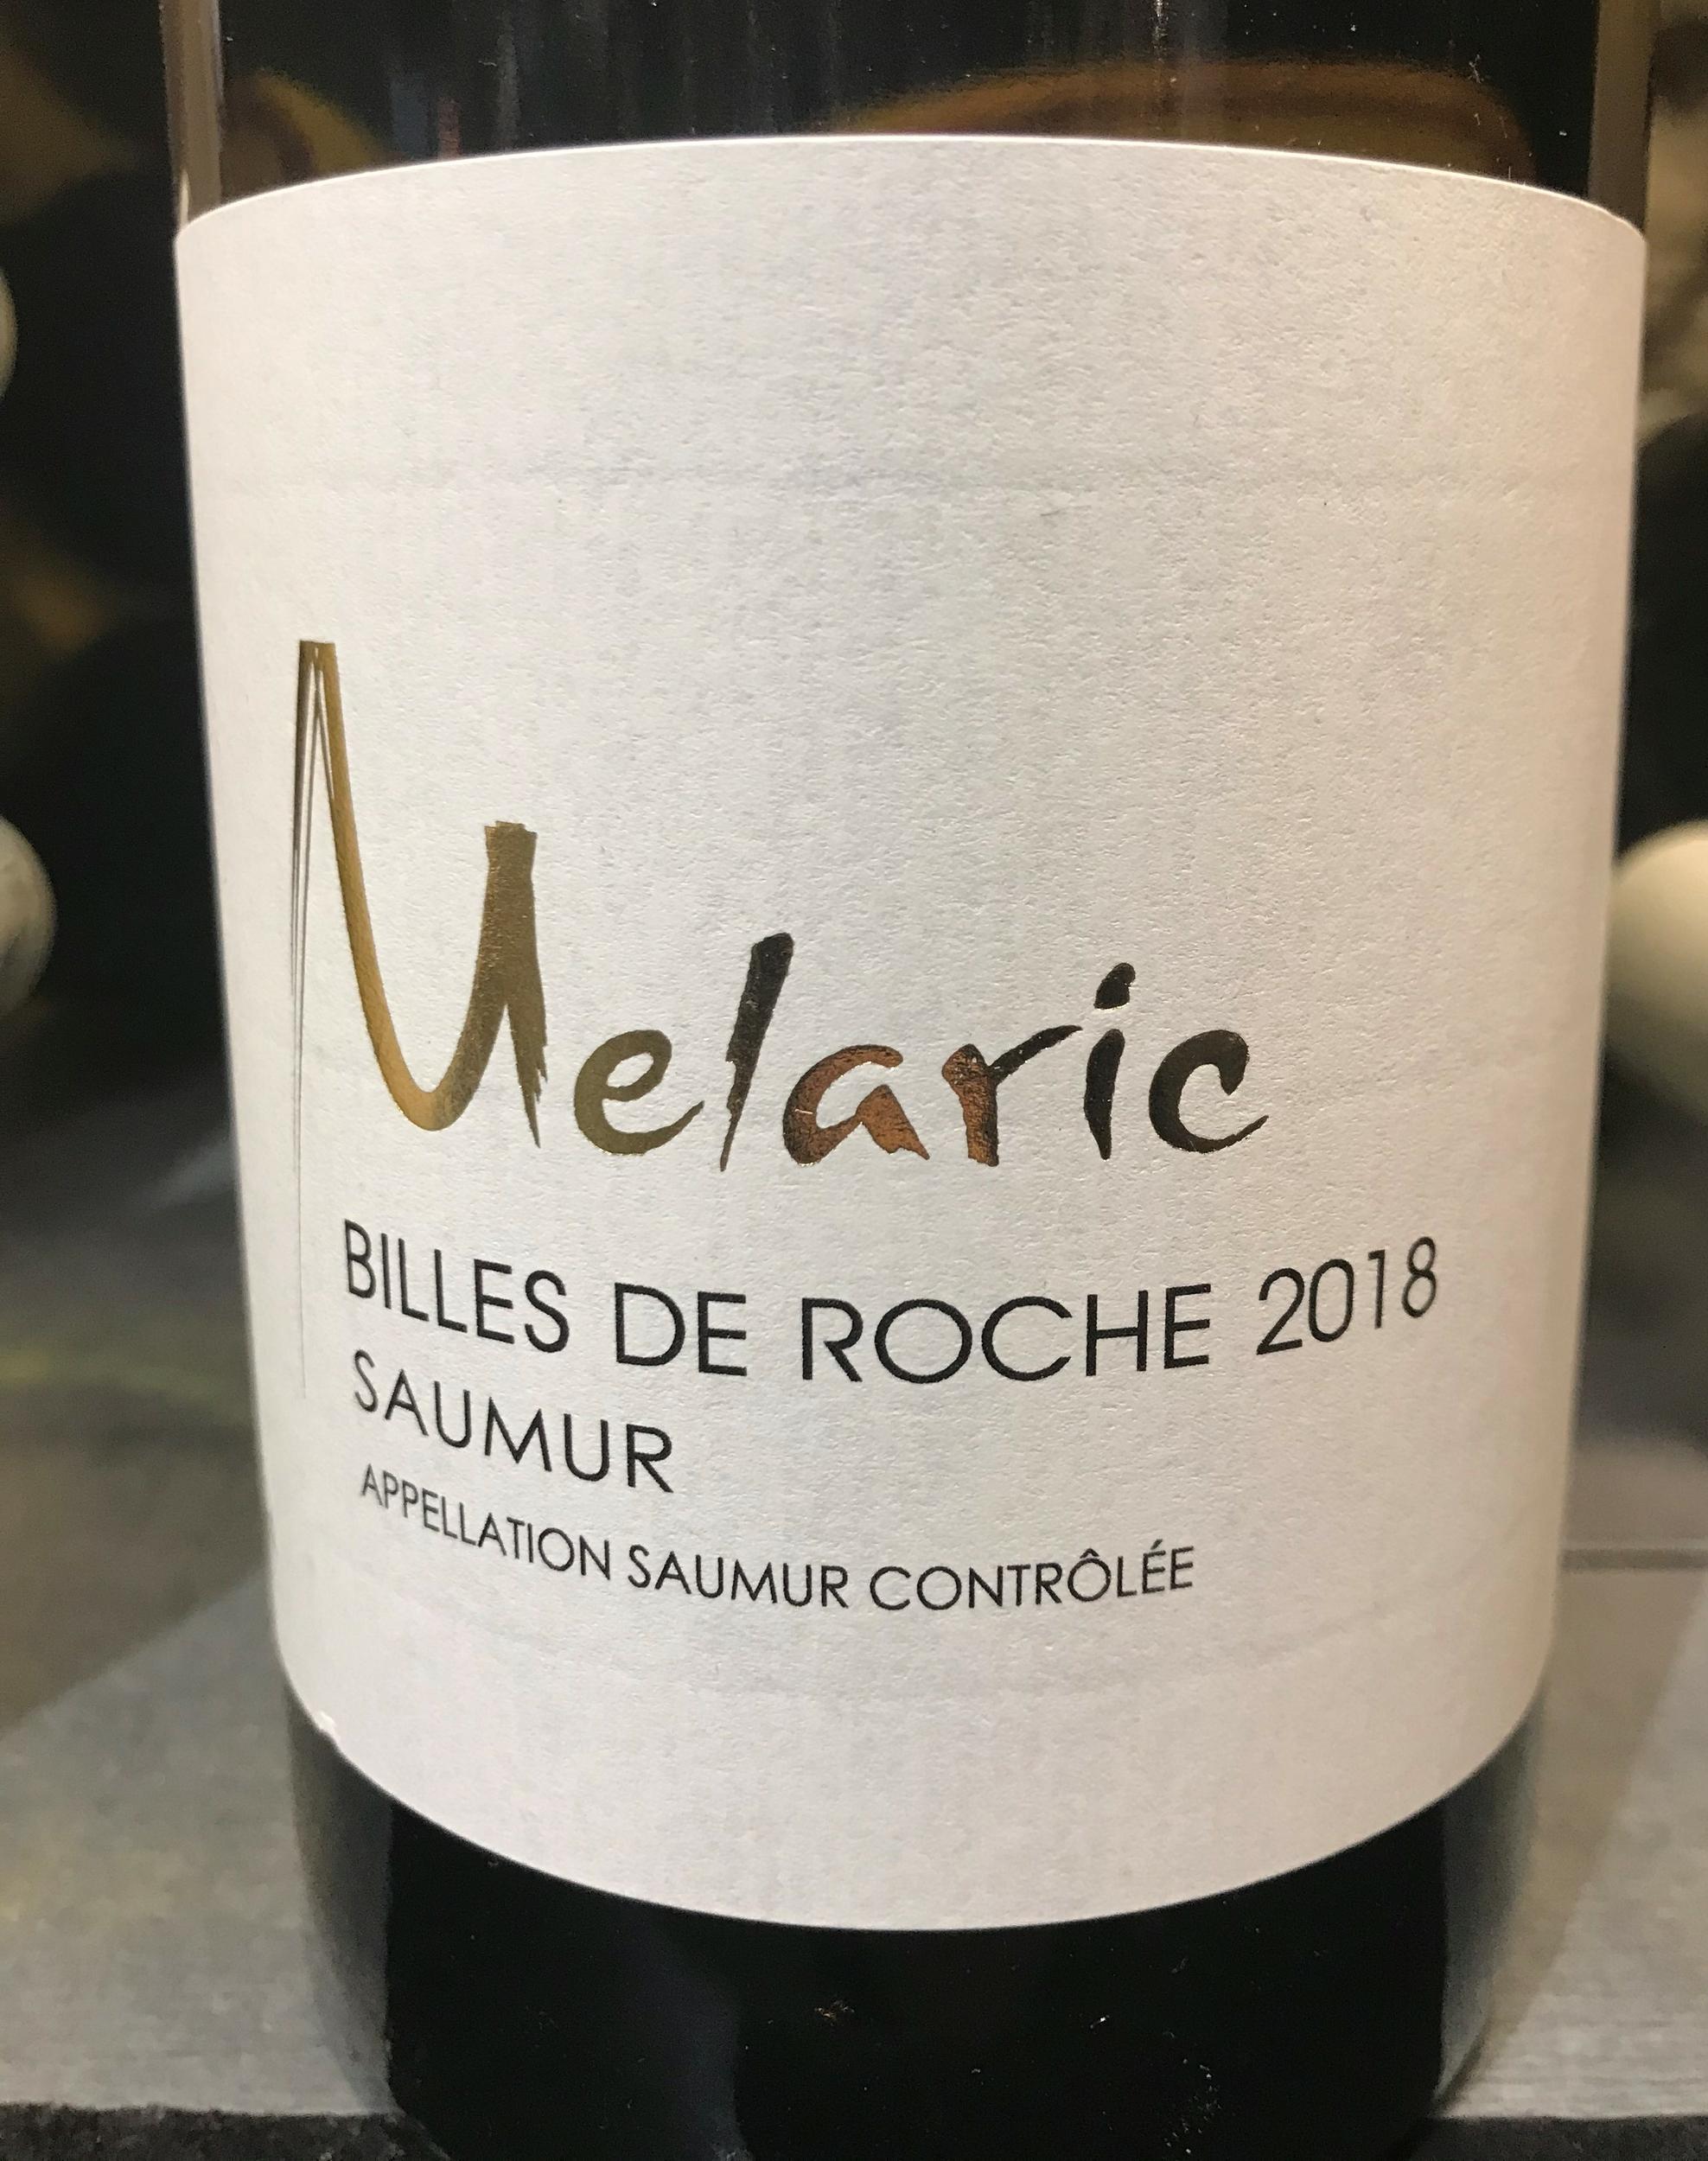 Billes de Roche Blanc 2018